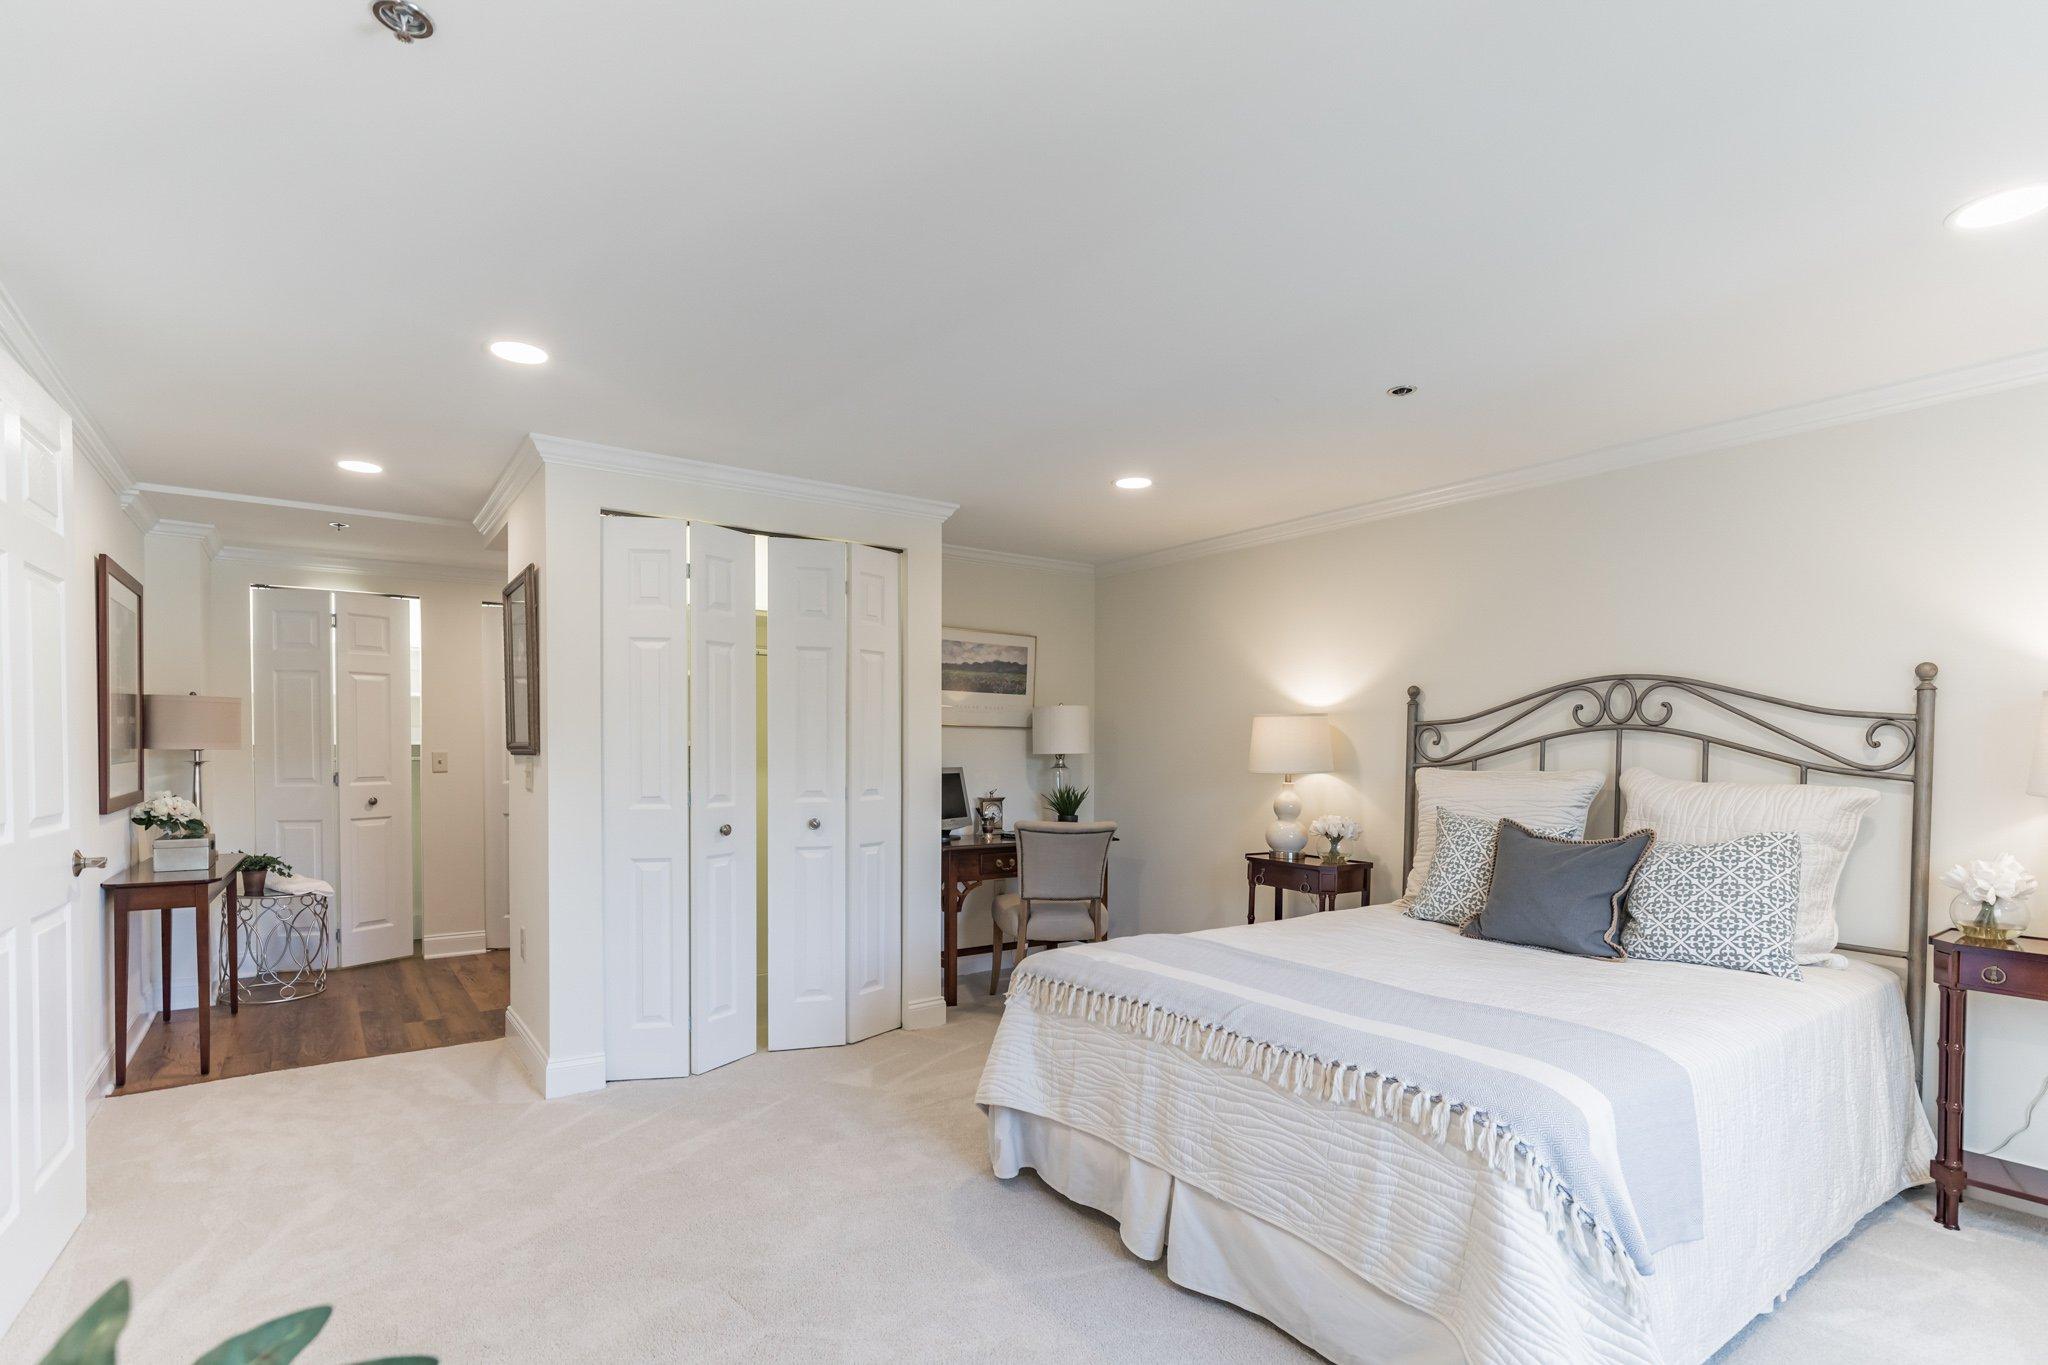 The Cheswick Series bedroom